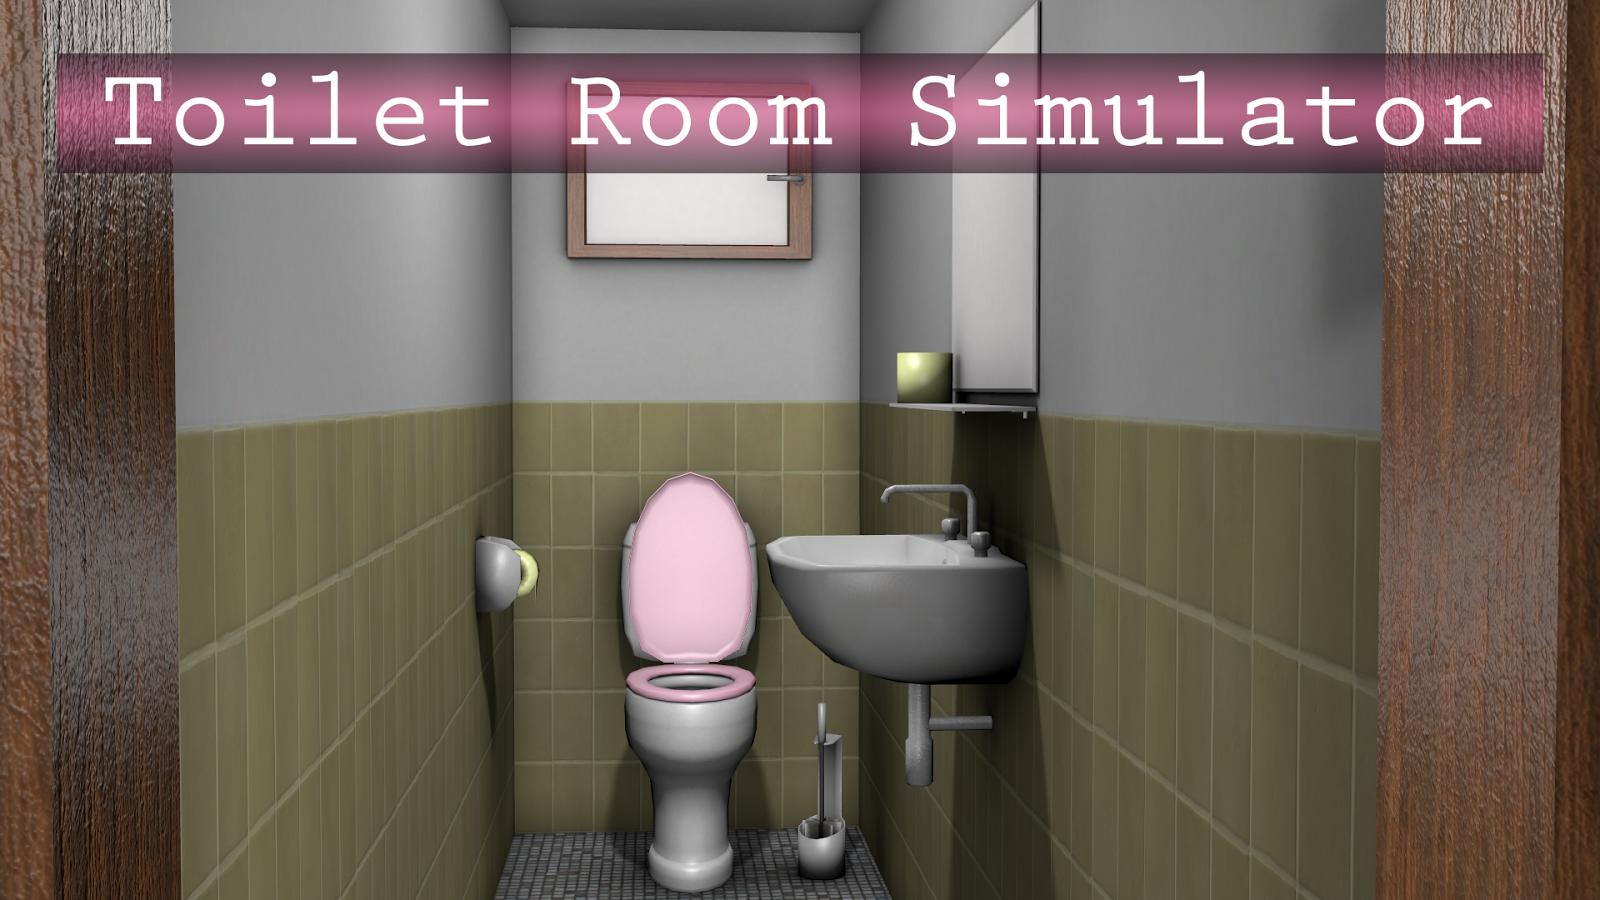 Toilet Room Simulator  screenshot. Toilet Room Simulator   Android Apps on Google Play